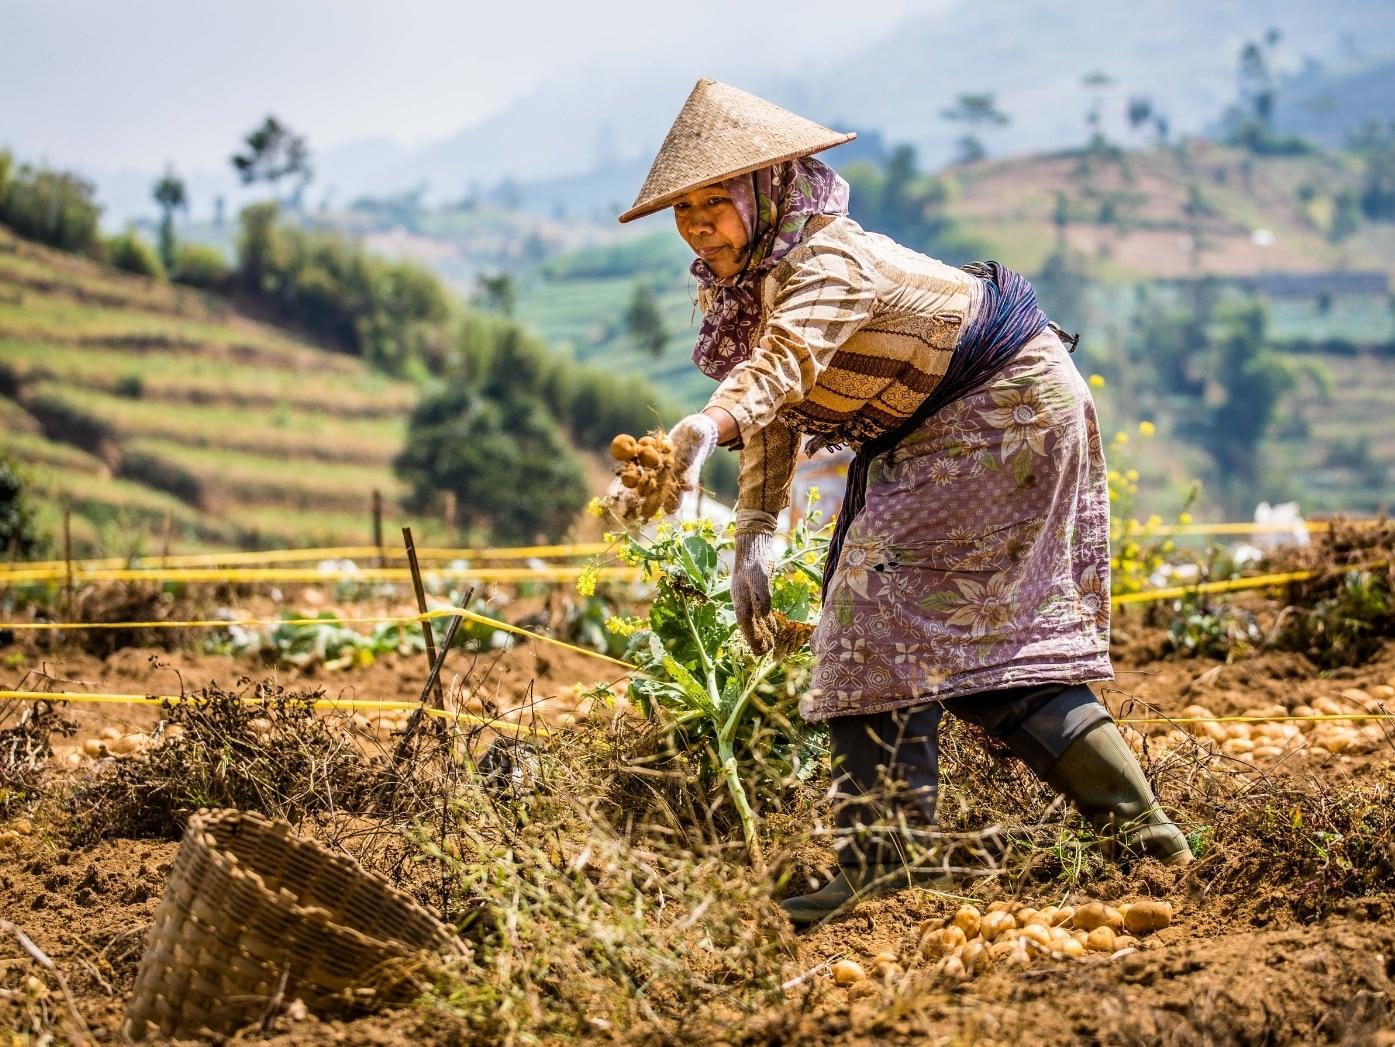 Smallholder farmer harvesting in Indonesia